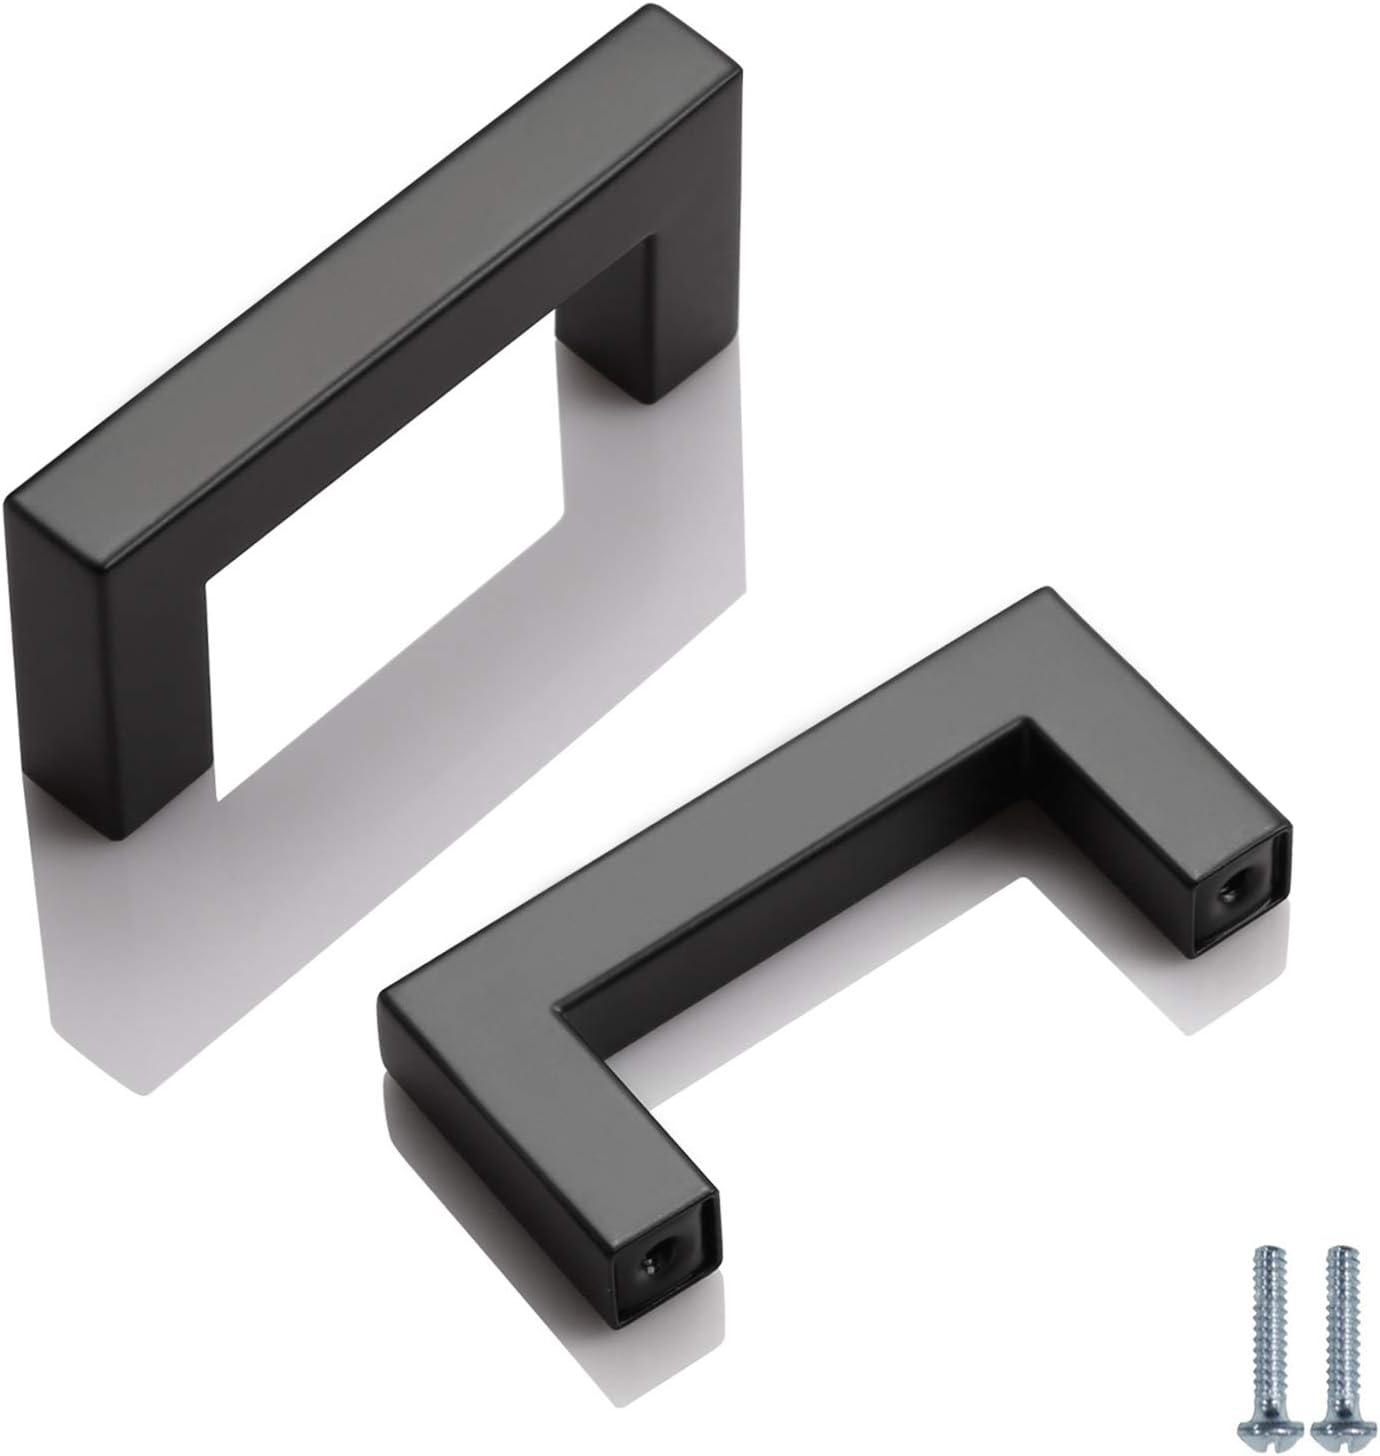 Modern Contemporary Black Cabinet Pulls Black Dresser Pulls Black Hardware Bar Pulls Black Drawer Pulls Lot of 5 Black Cabinet Handles